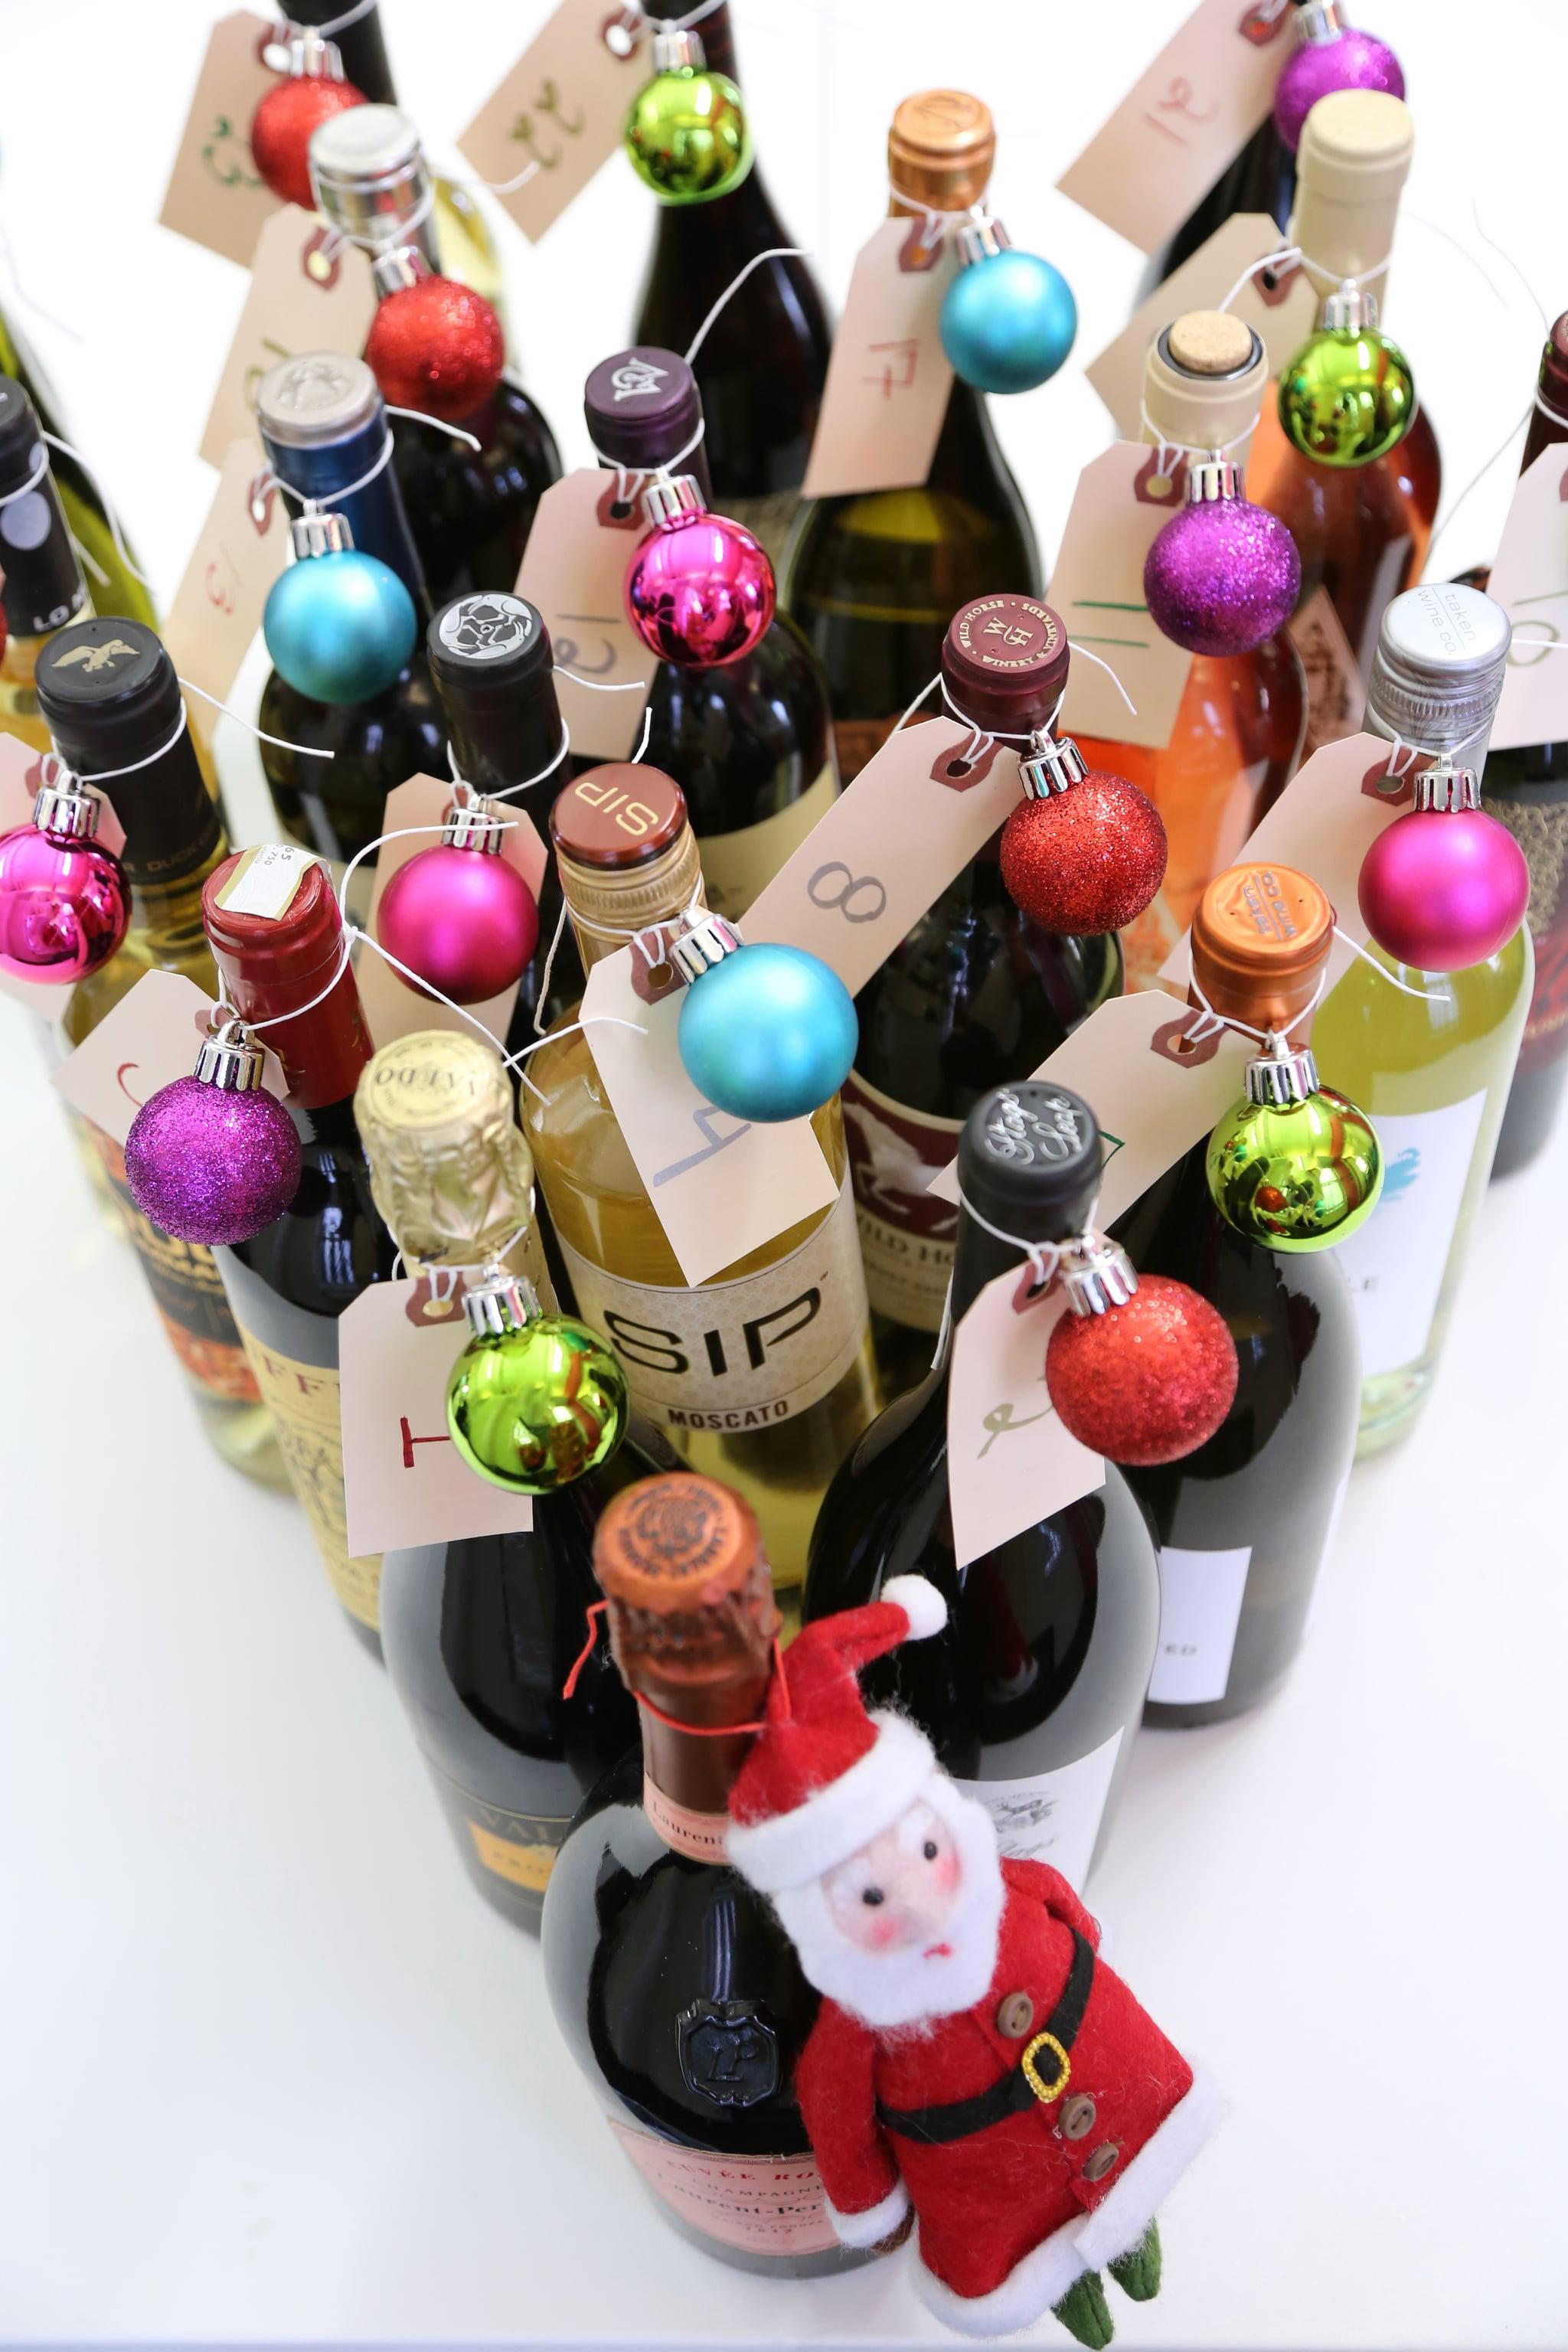 Diy Wine Advent Calendar : Diy wine advent calendar popsugar food